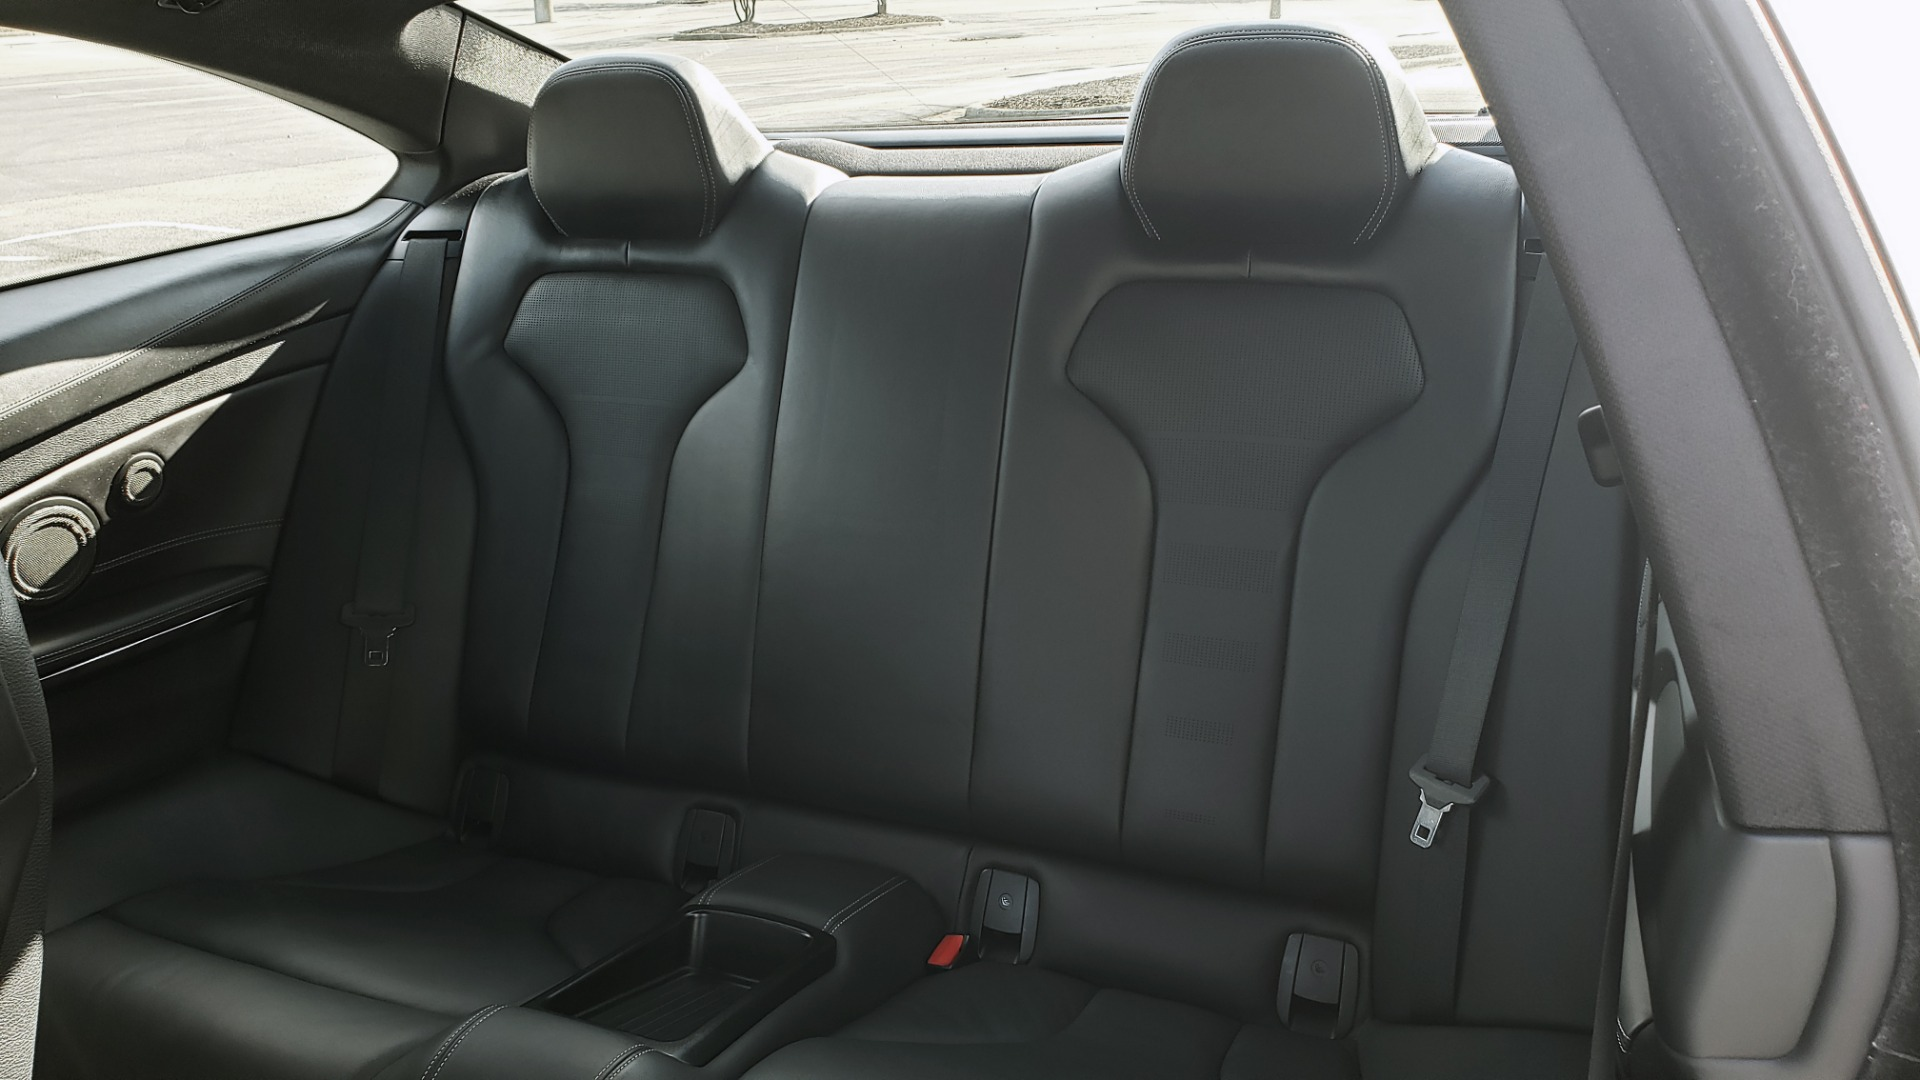 Used 2015 BMW M4 COUPE / EXEC PKG / DRVR ASST PLUS / LIGHTING / M-SUSPENSION for sale Sold at Formula Imports in Charlotte NC 28227 68